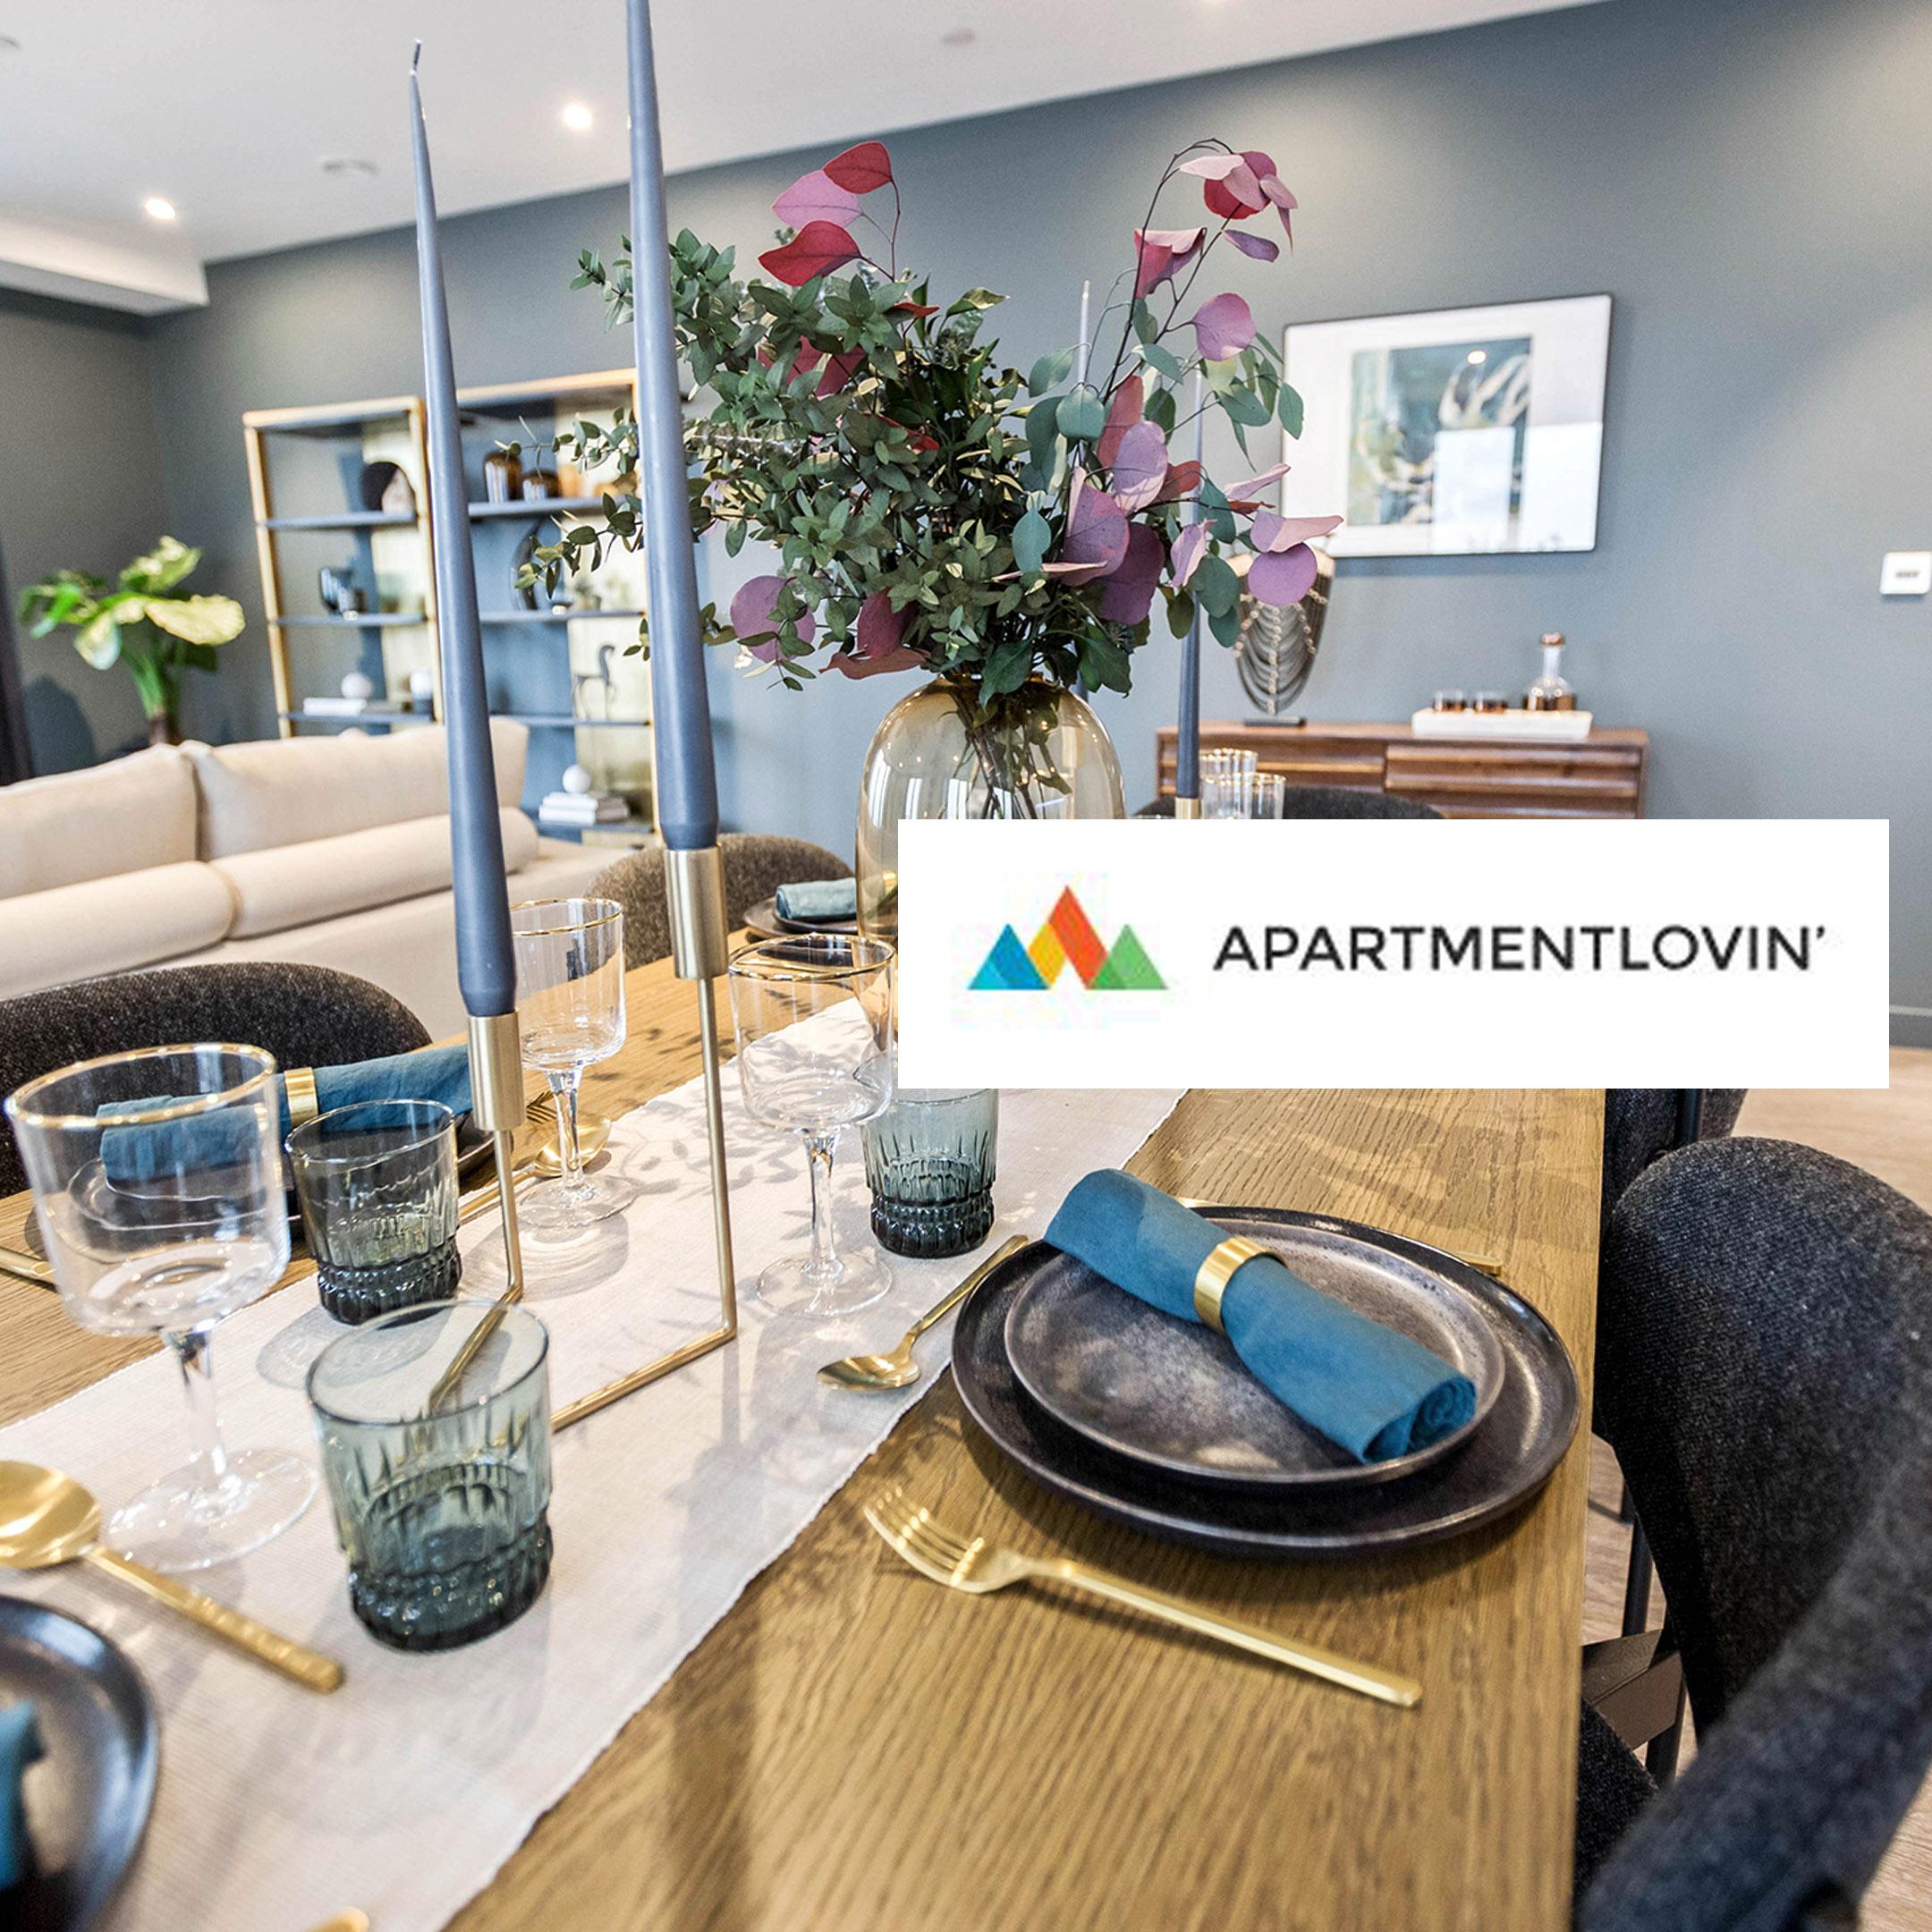 Mount Anvil Apartmentlovin.jpg